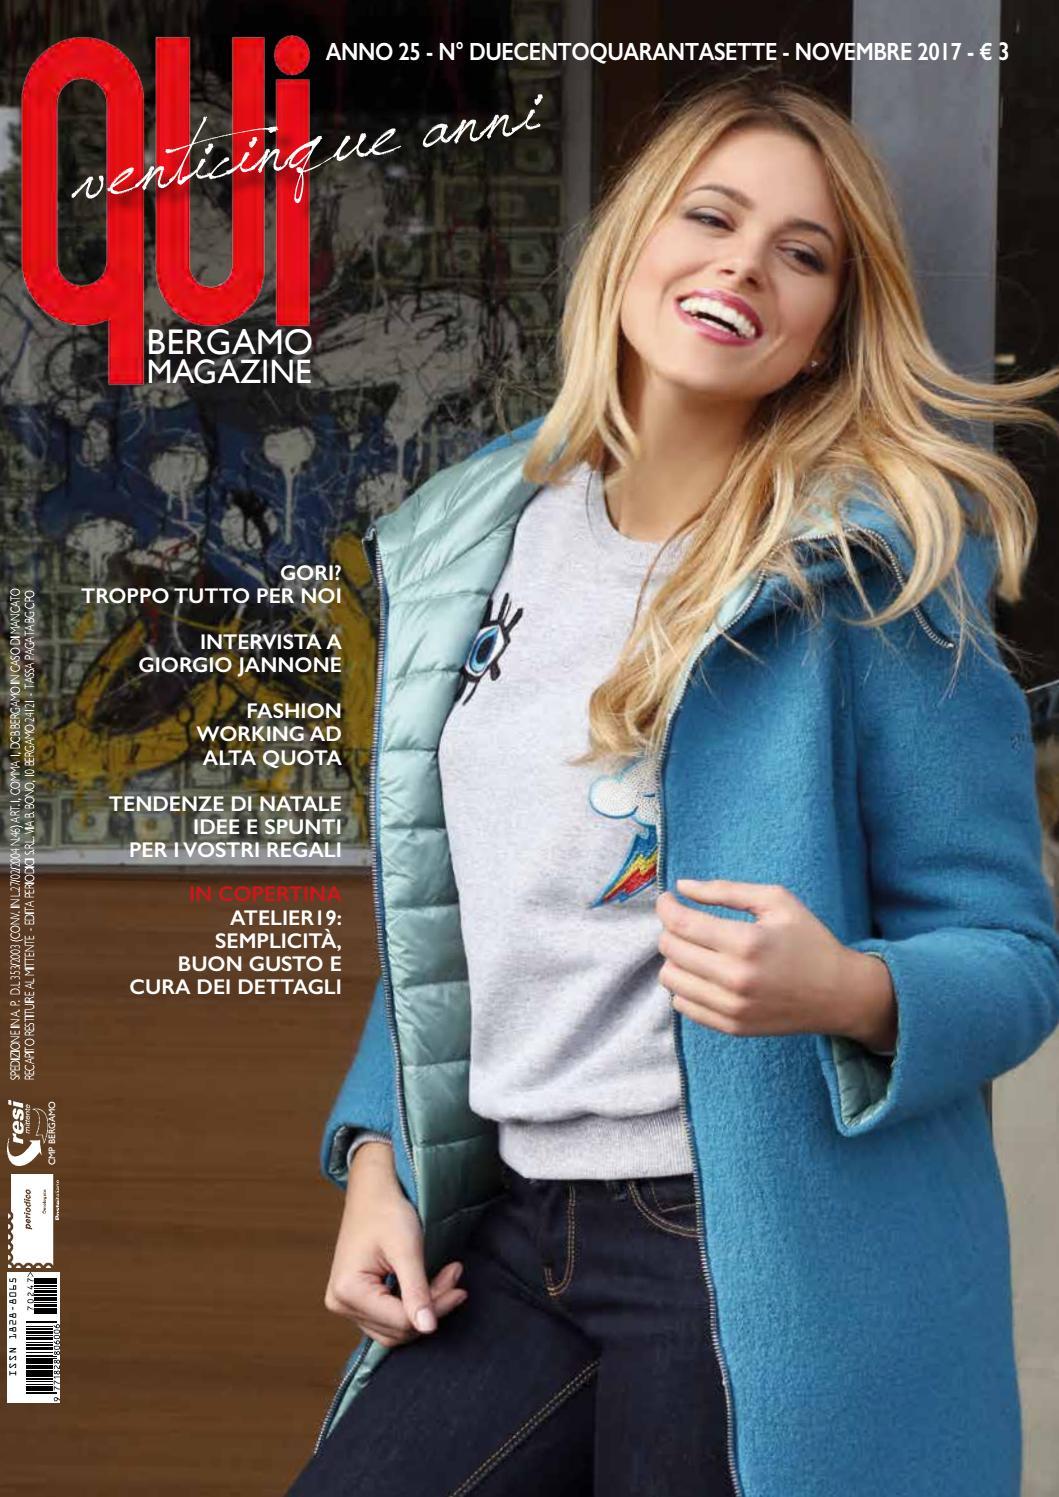 Qui Bergamo n.ro 247 by EDITA PERIODICI - issuu 85af5cd315c